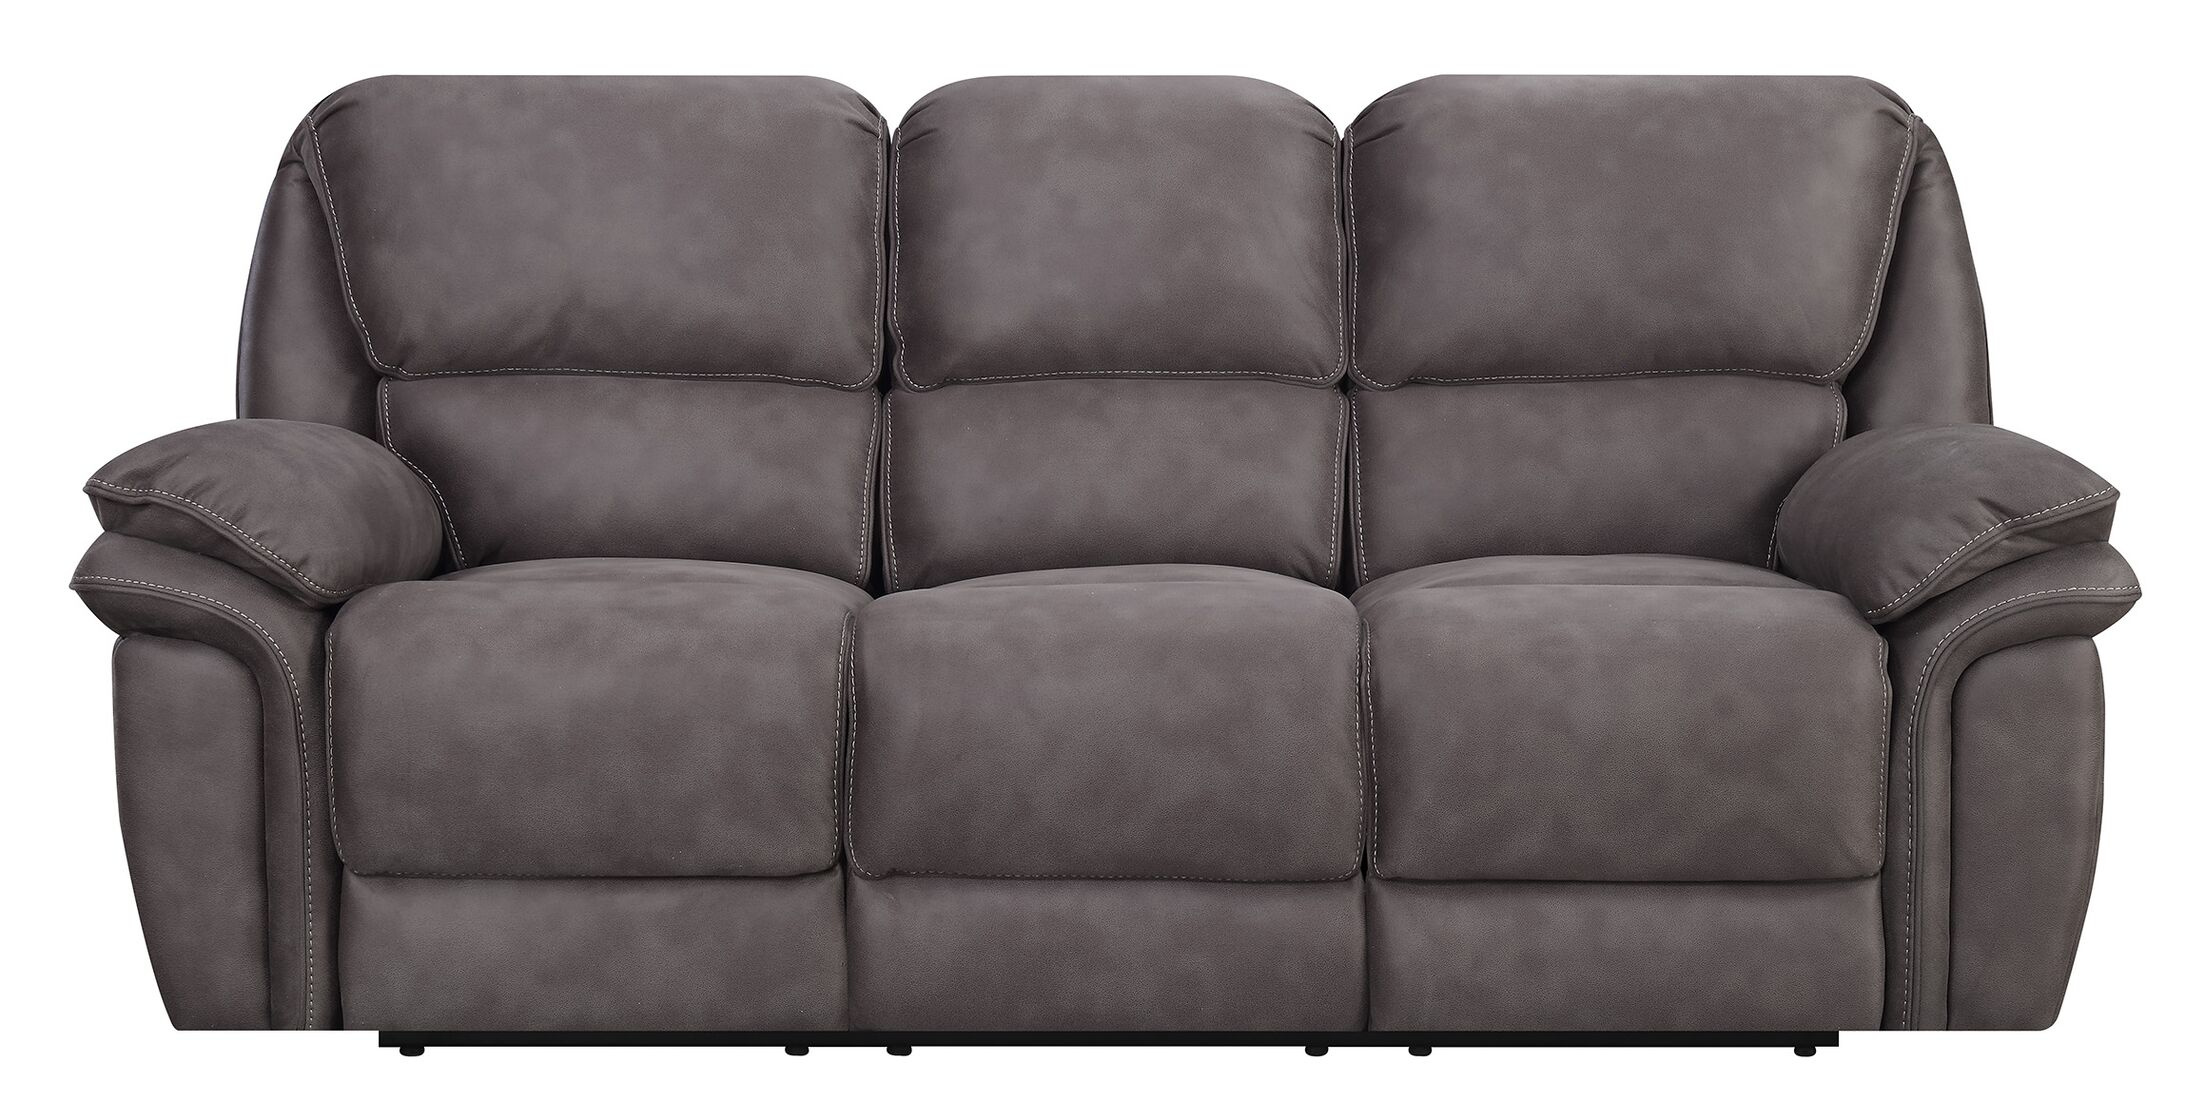 Cannaday Reclining Sofa Recliner Mechanism: Manual Recline